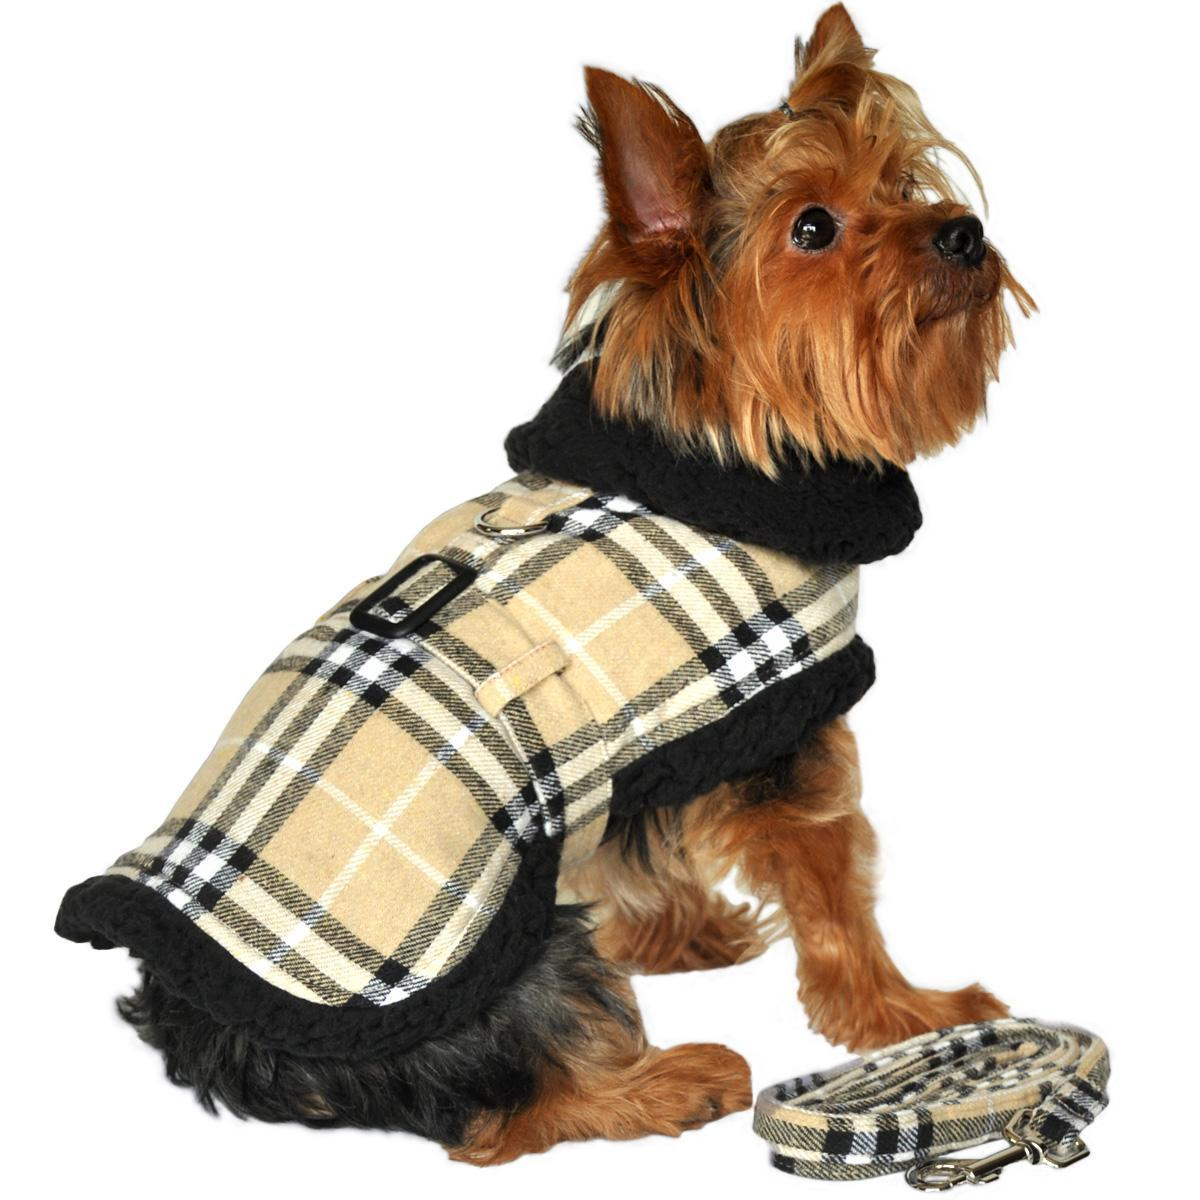 Doggie Design Plaid Sherpa Fleece Lined Dog Harness Coat - Camel & Black